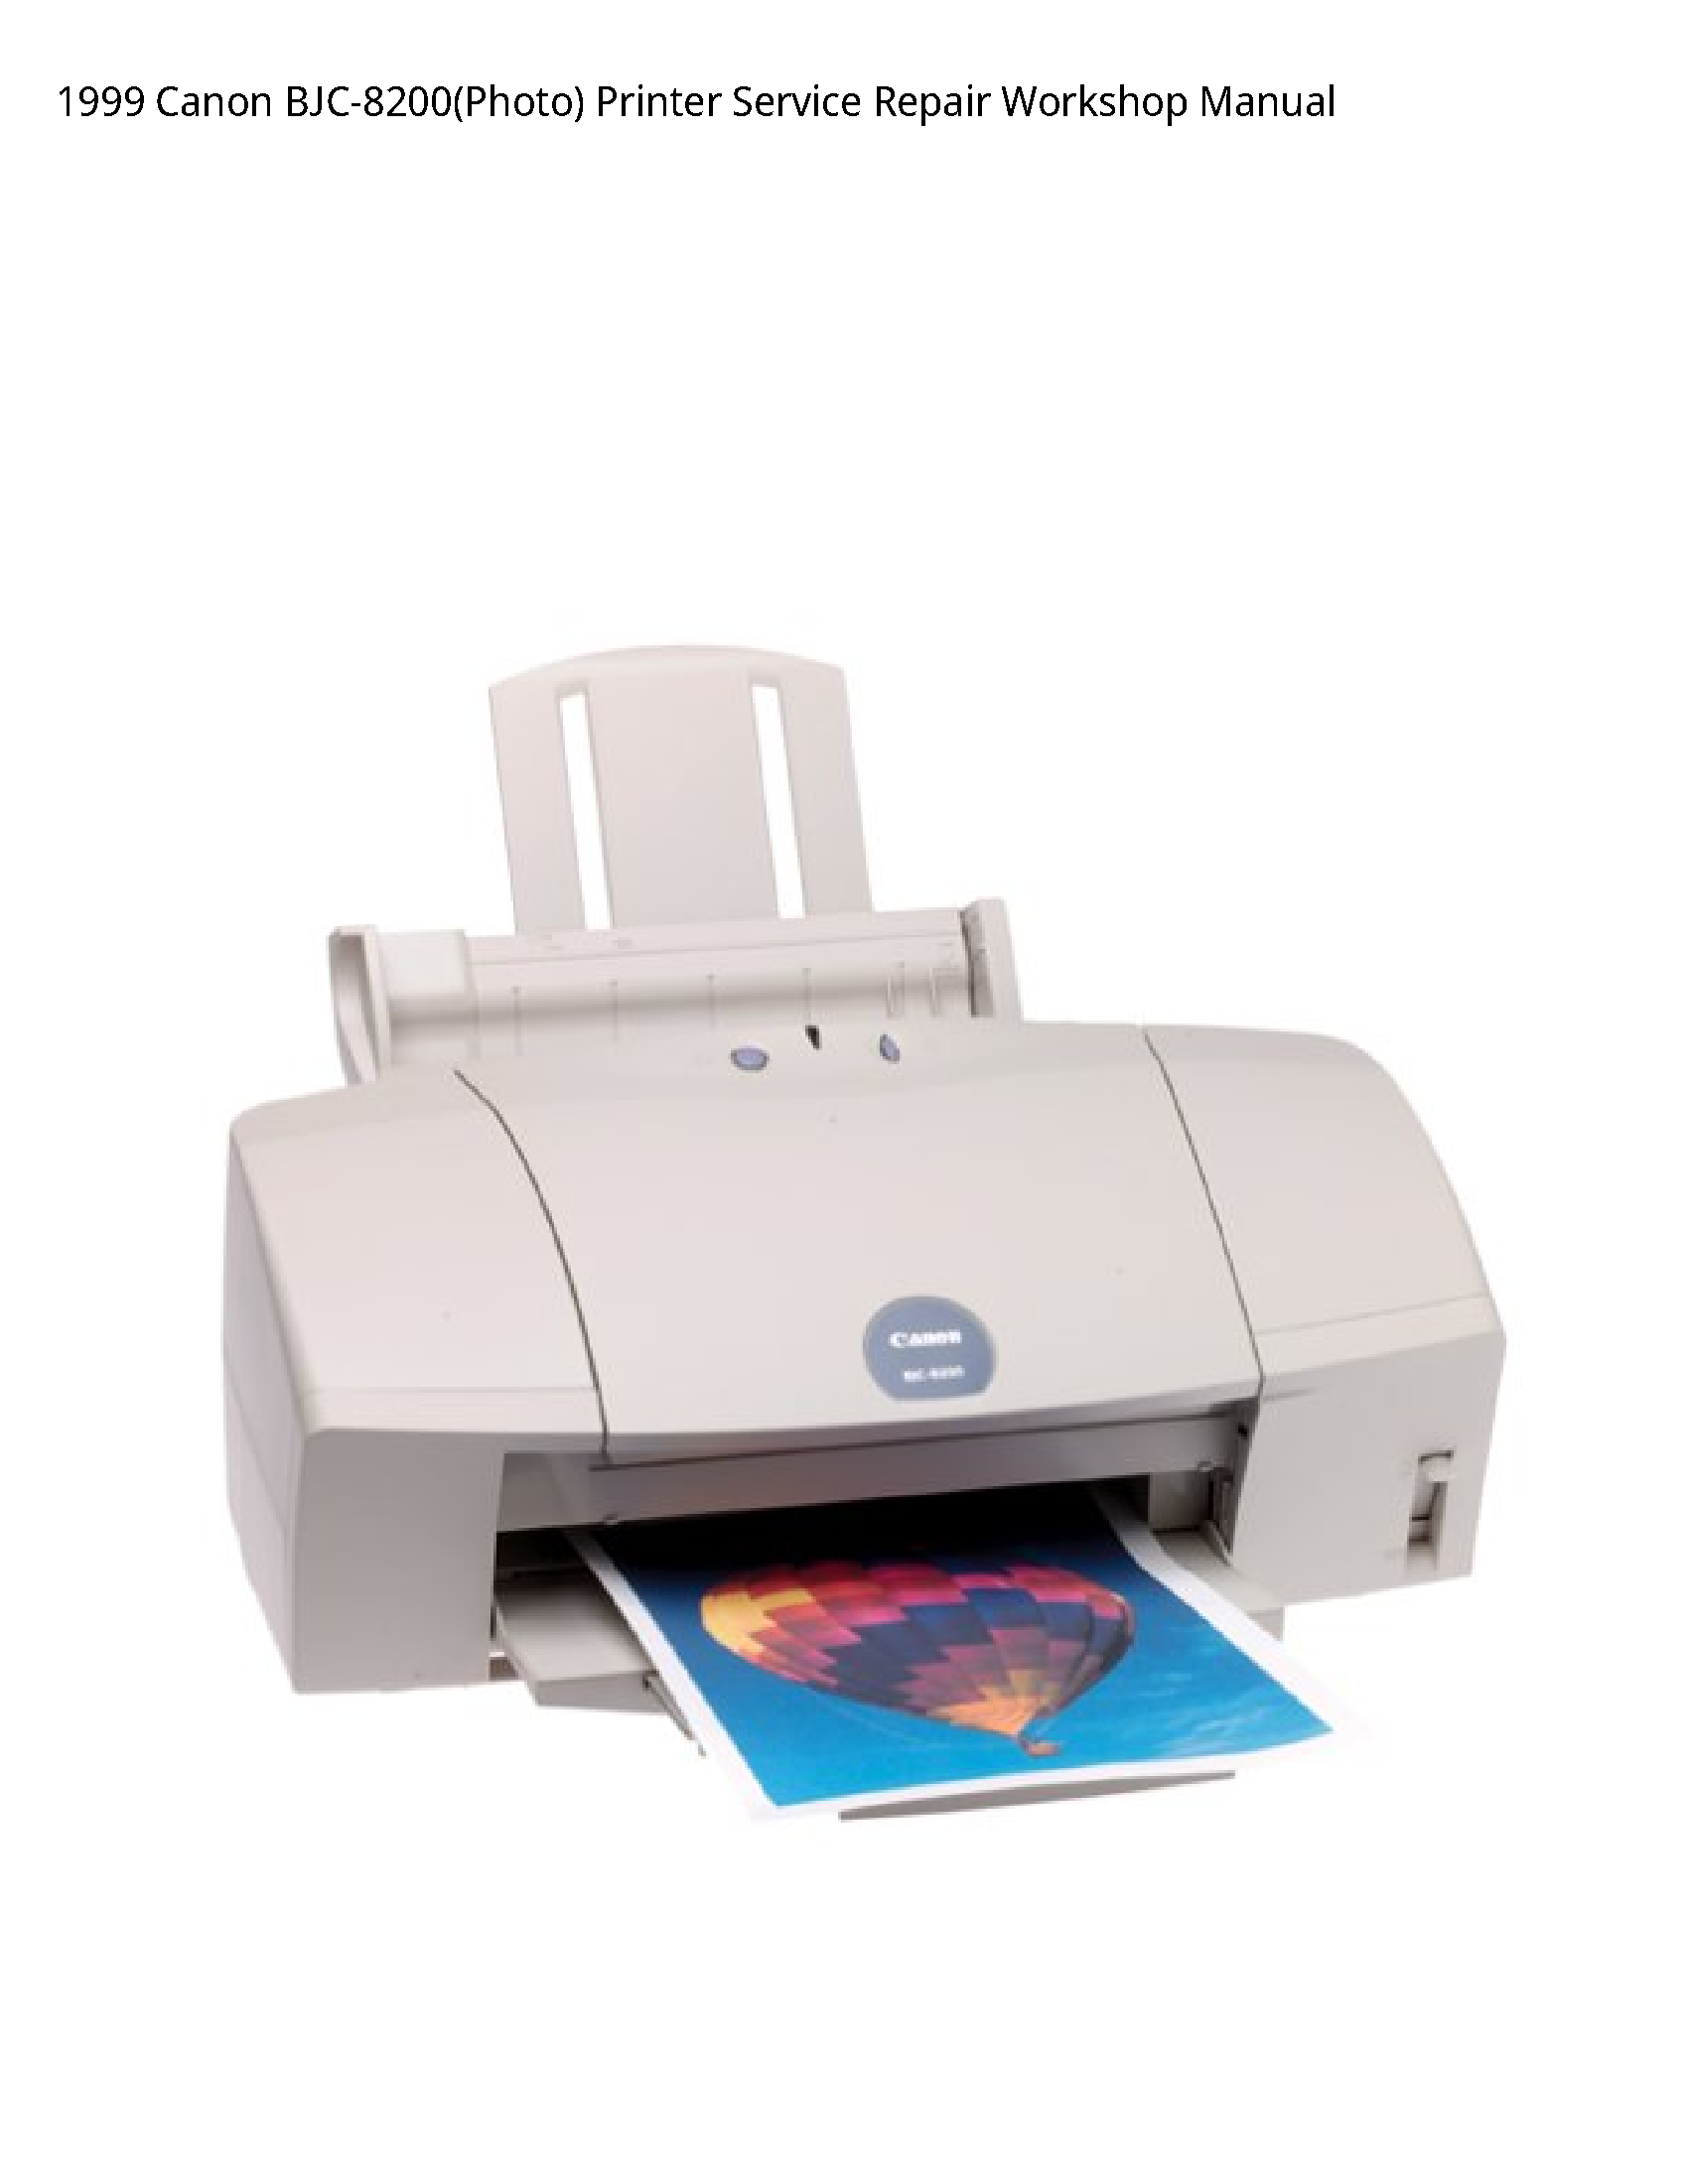 Canon BJC-8200(Photo) Printer manual